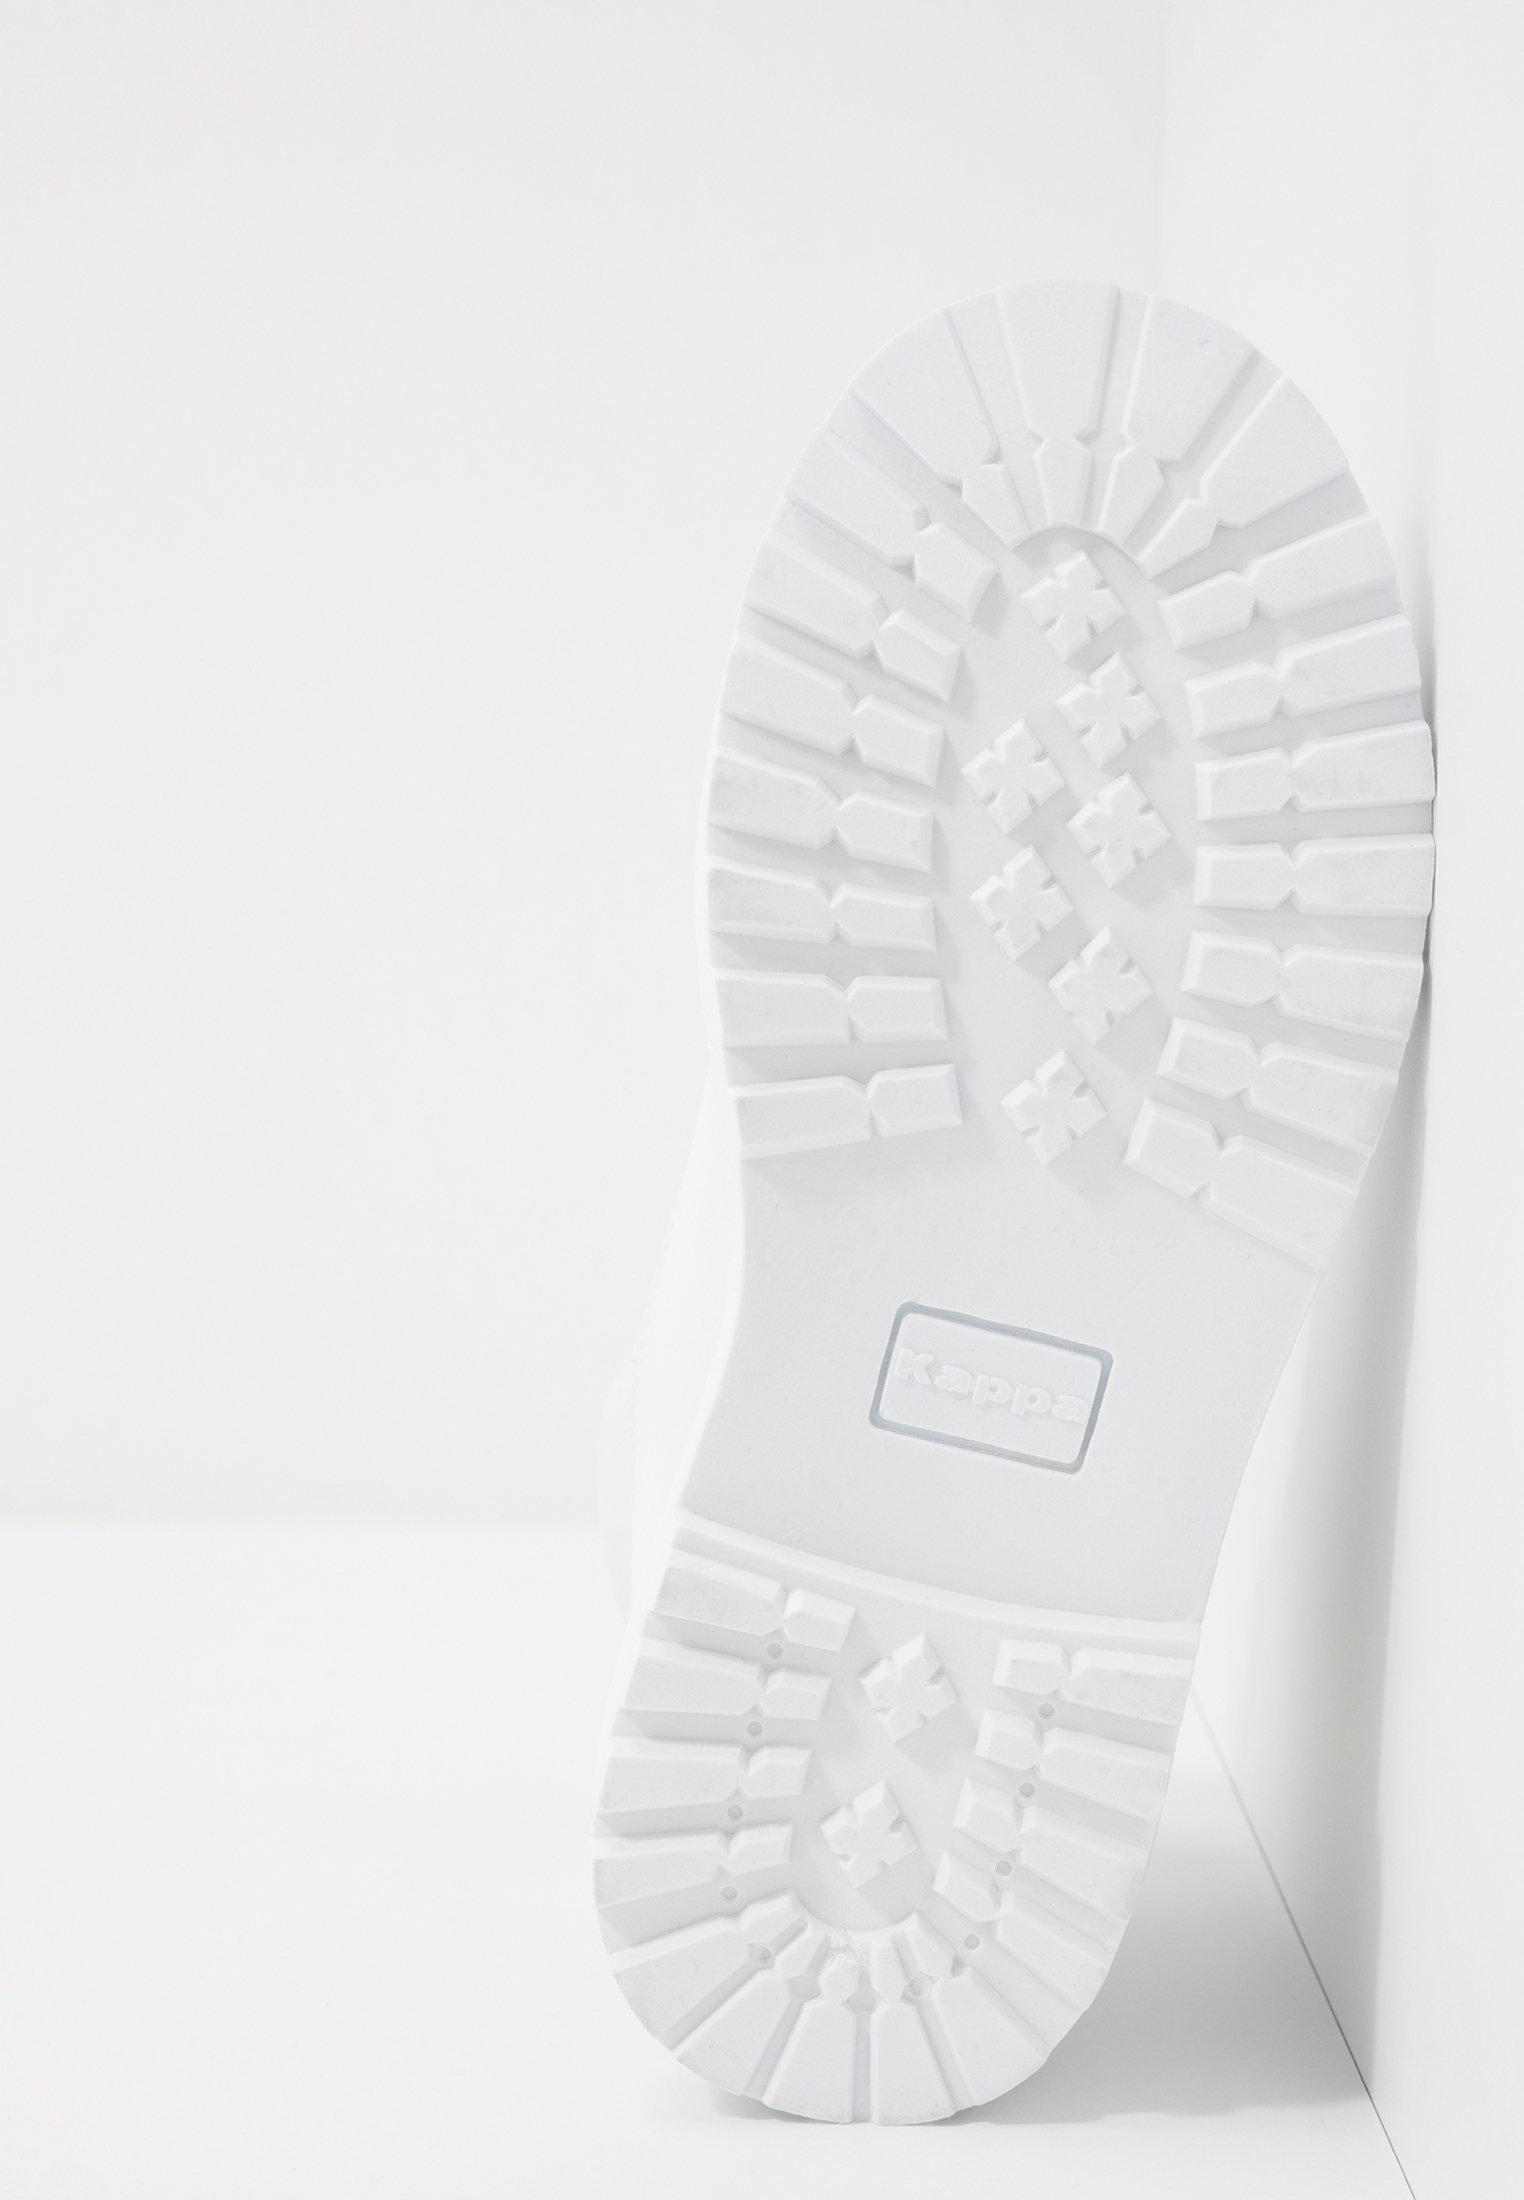 Grey White MidChaussures De Kombo Kappa Marche light eIYWEDH29